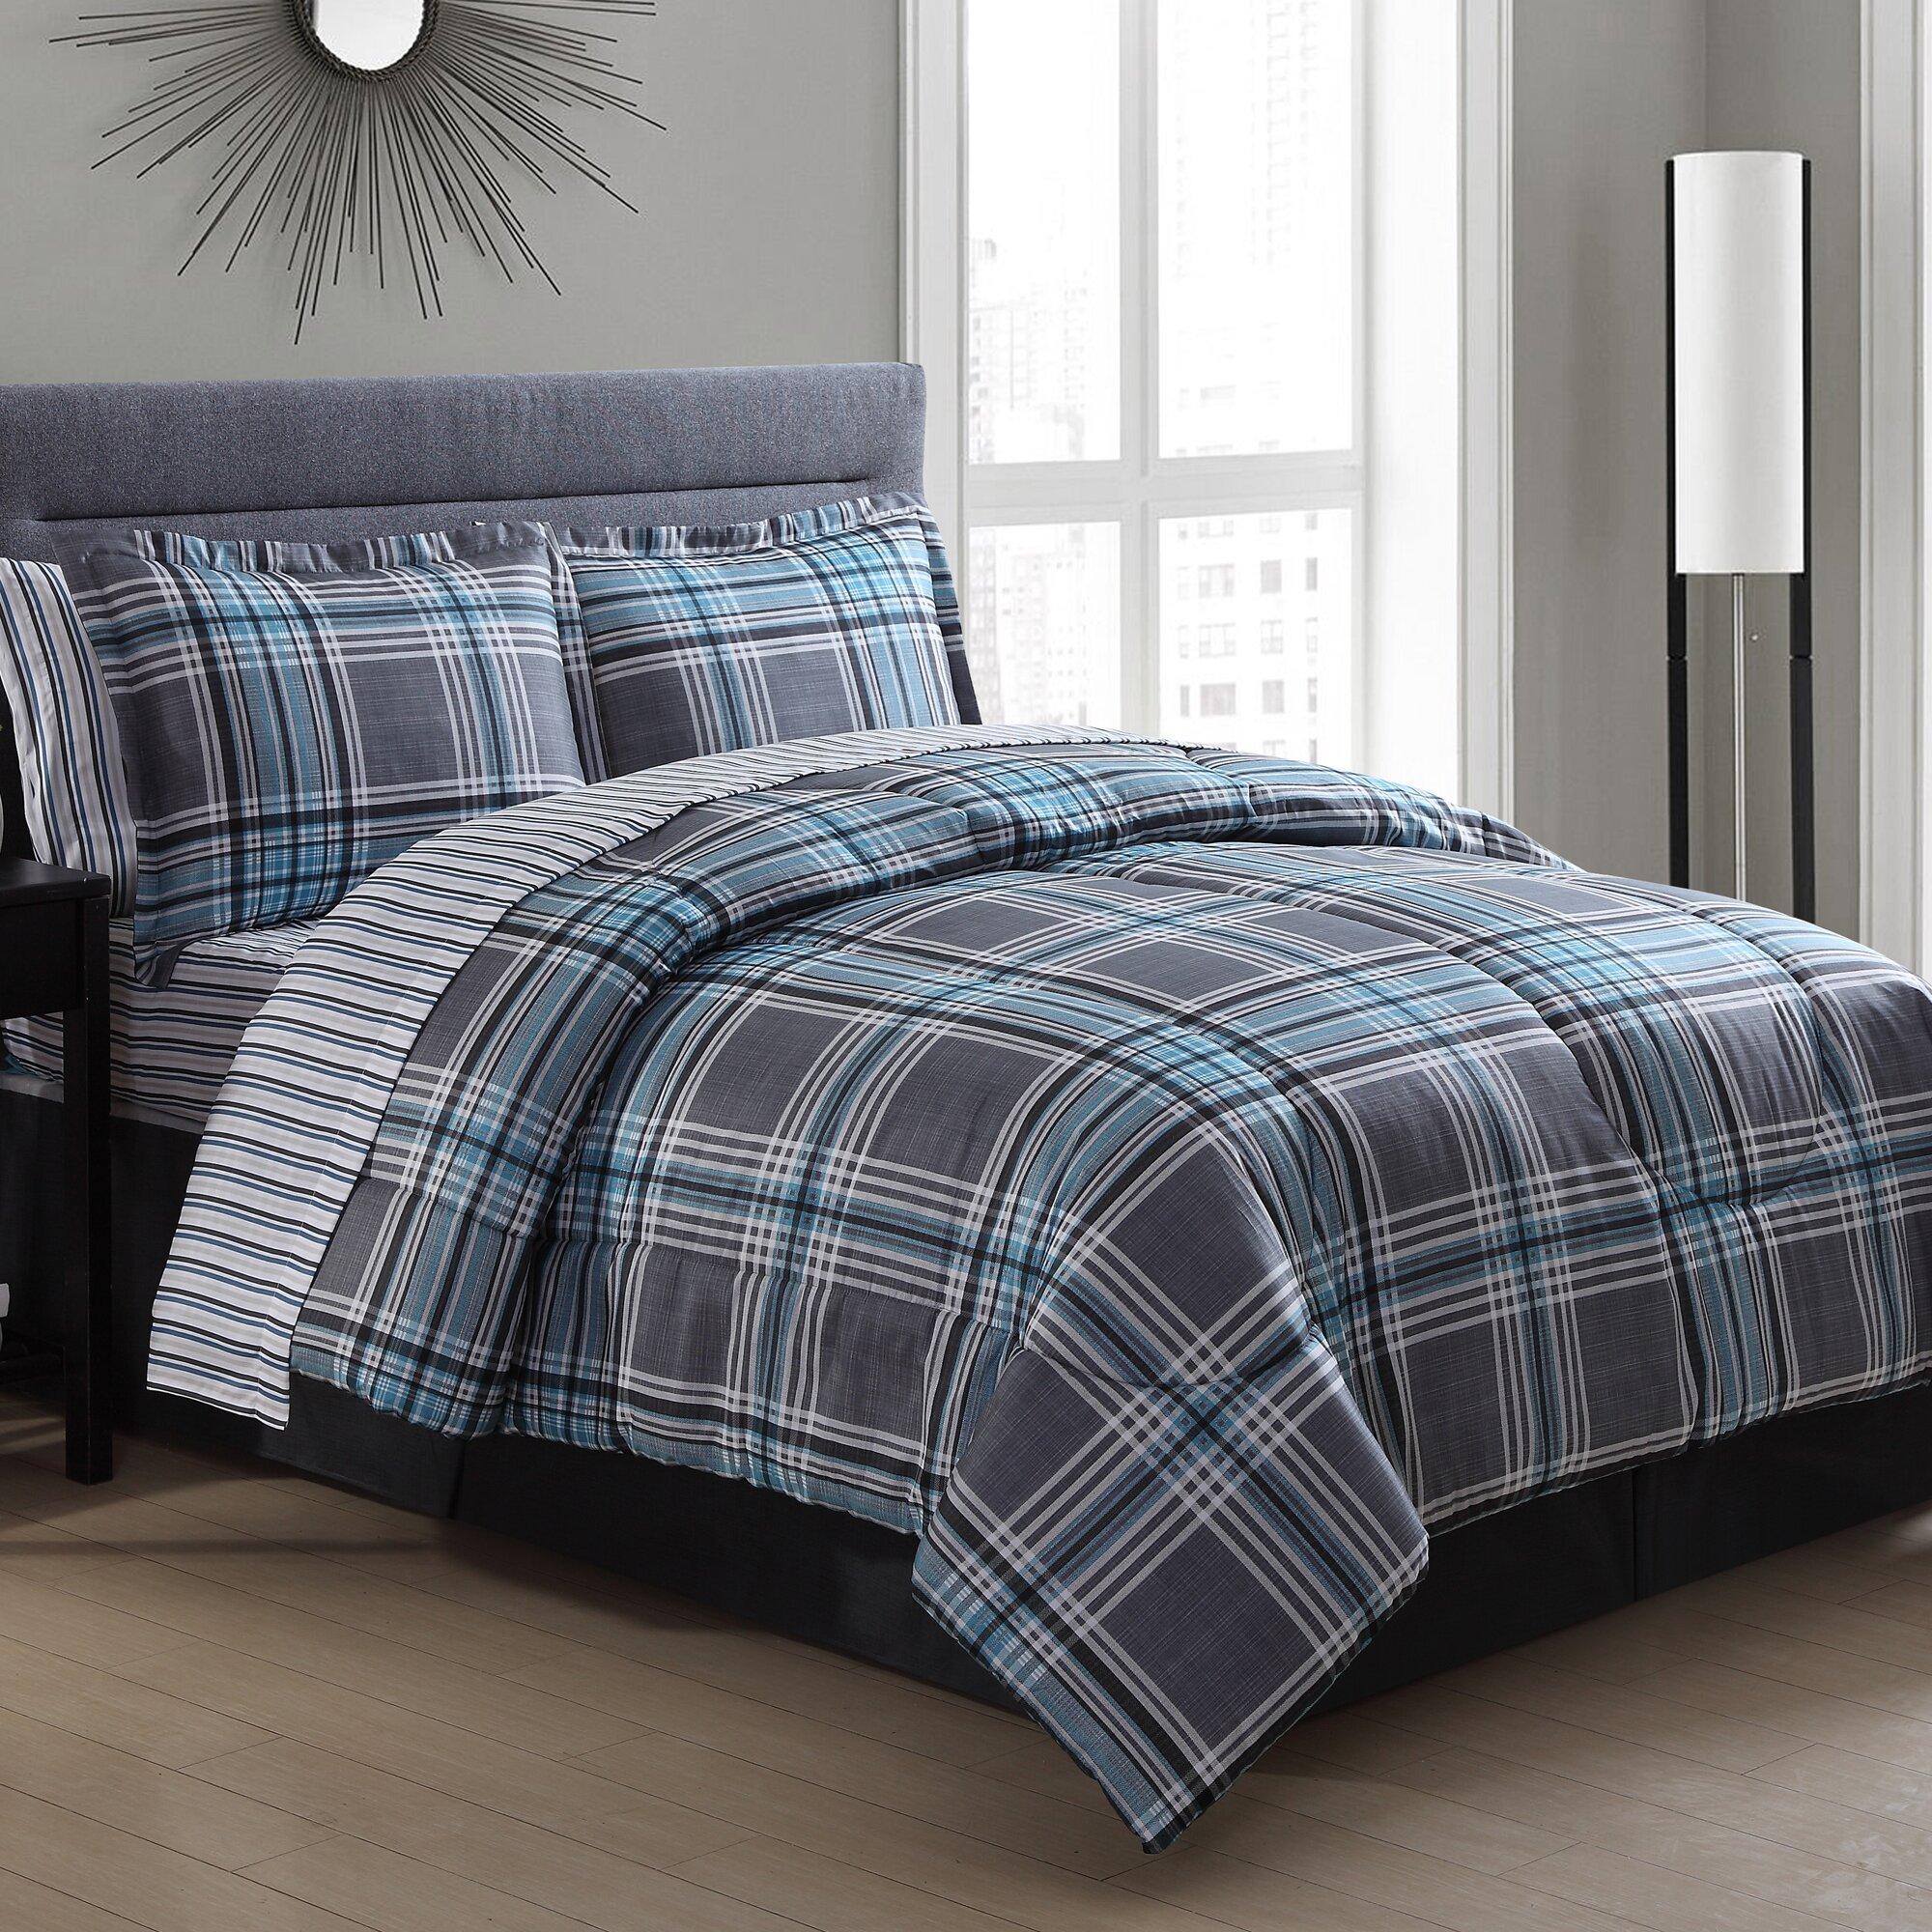 Chelsea Plaid Bed In A Bag Set Wayfair